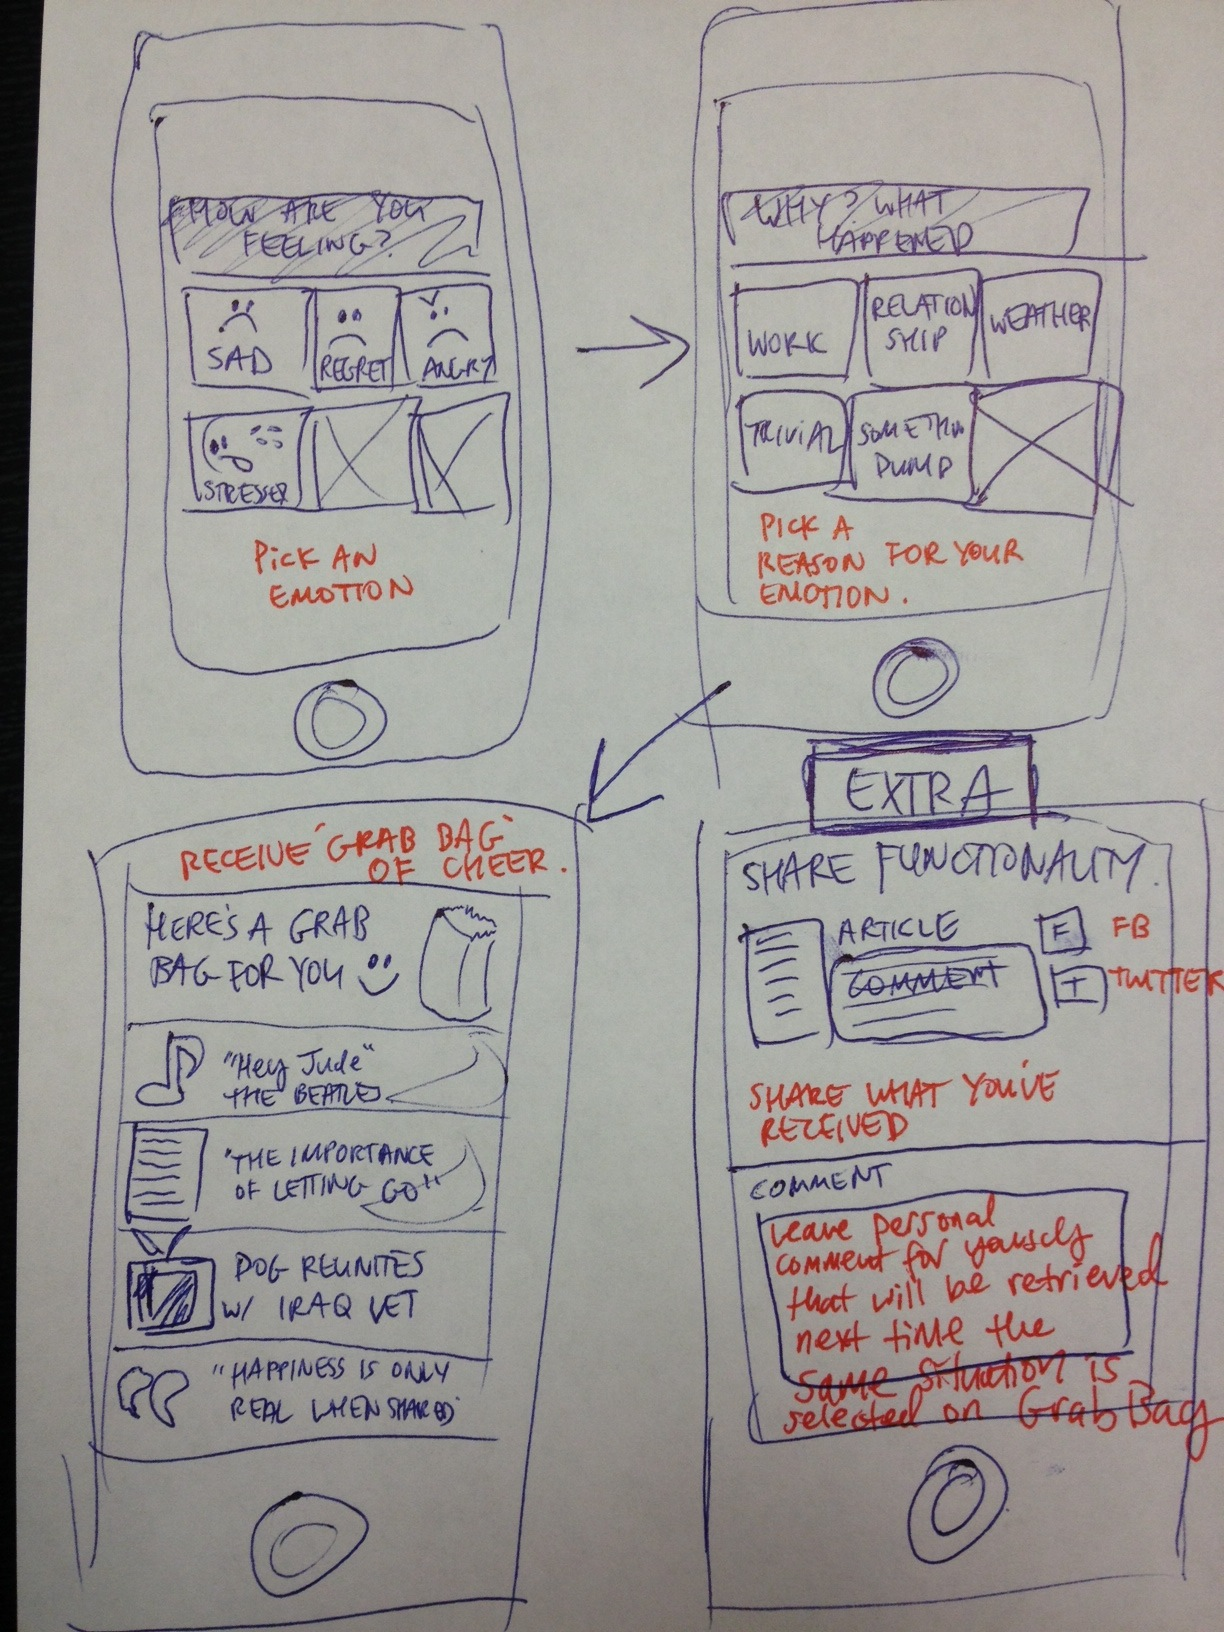 GRAB BAG - grab some cheer  - image 1 - student project